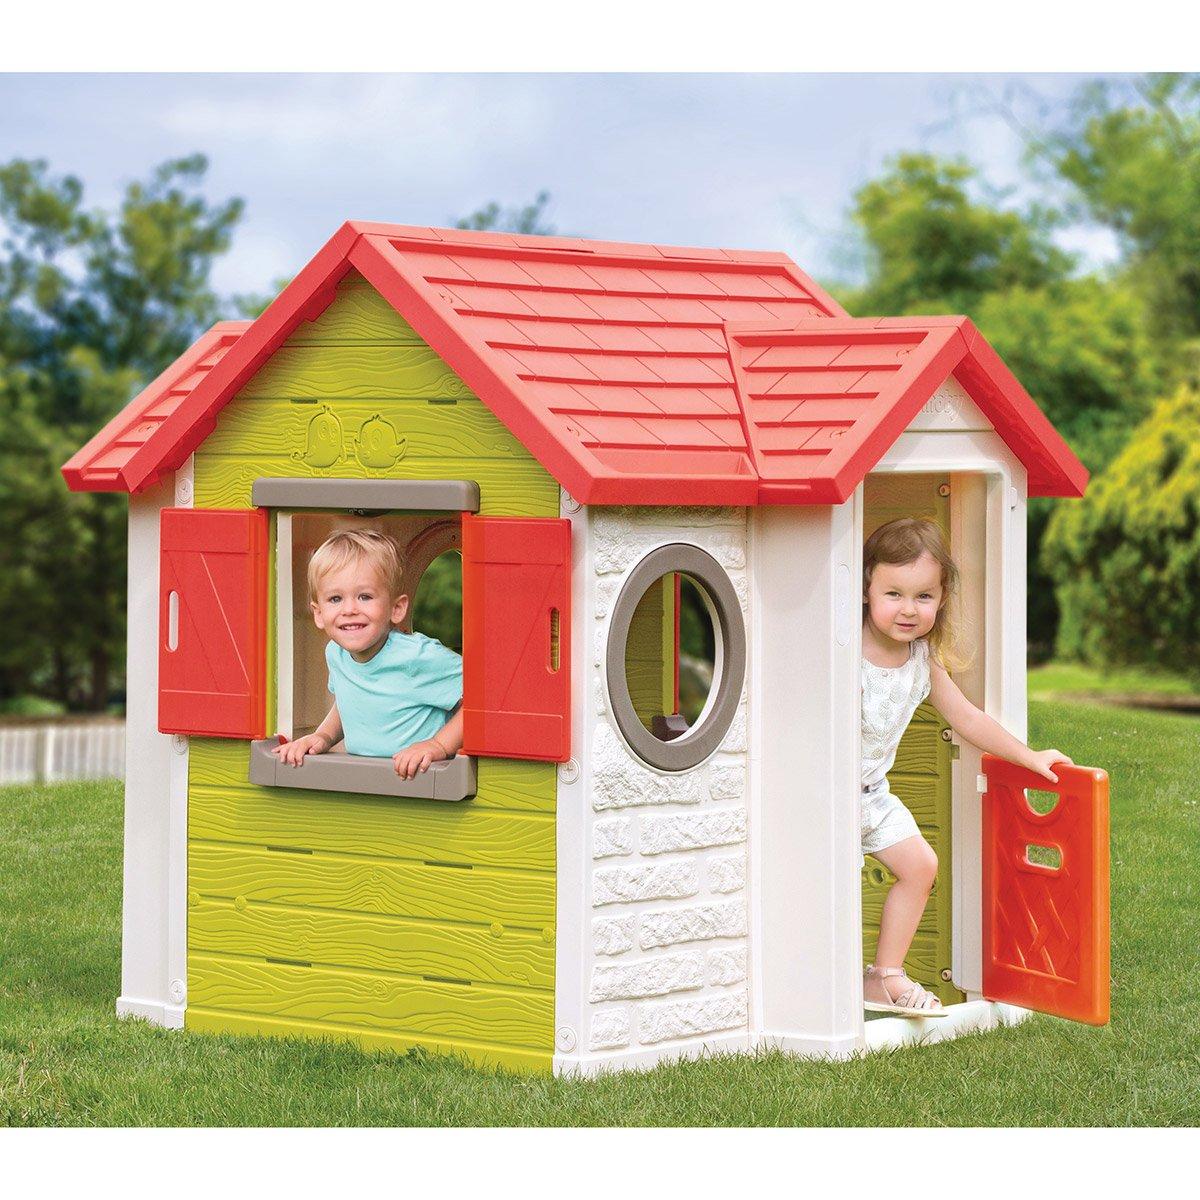 Maison My Neo House - Smoby - Maisons, Toboggans Et Jeux D ... concernant Maison Jardin Smoby